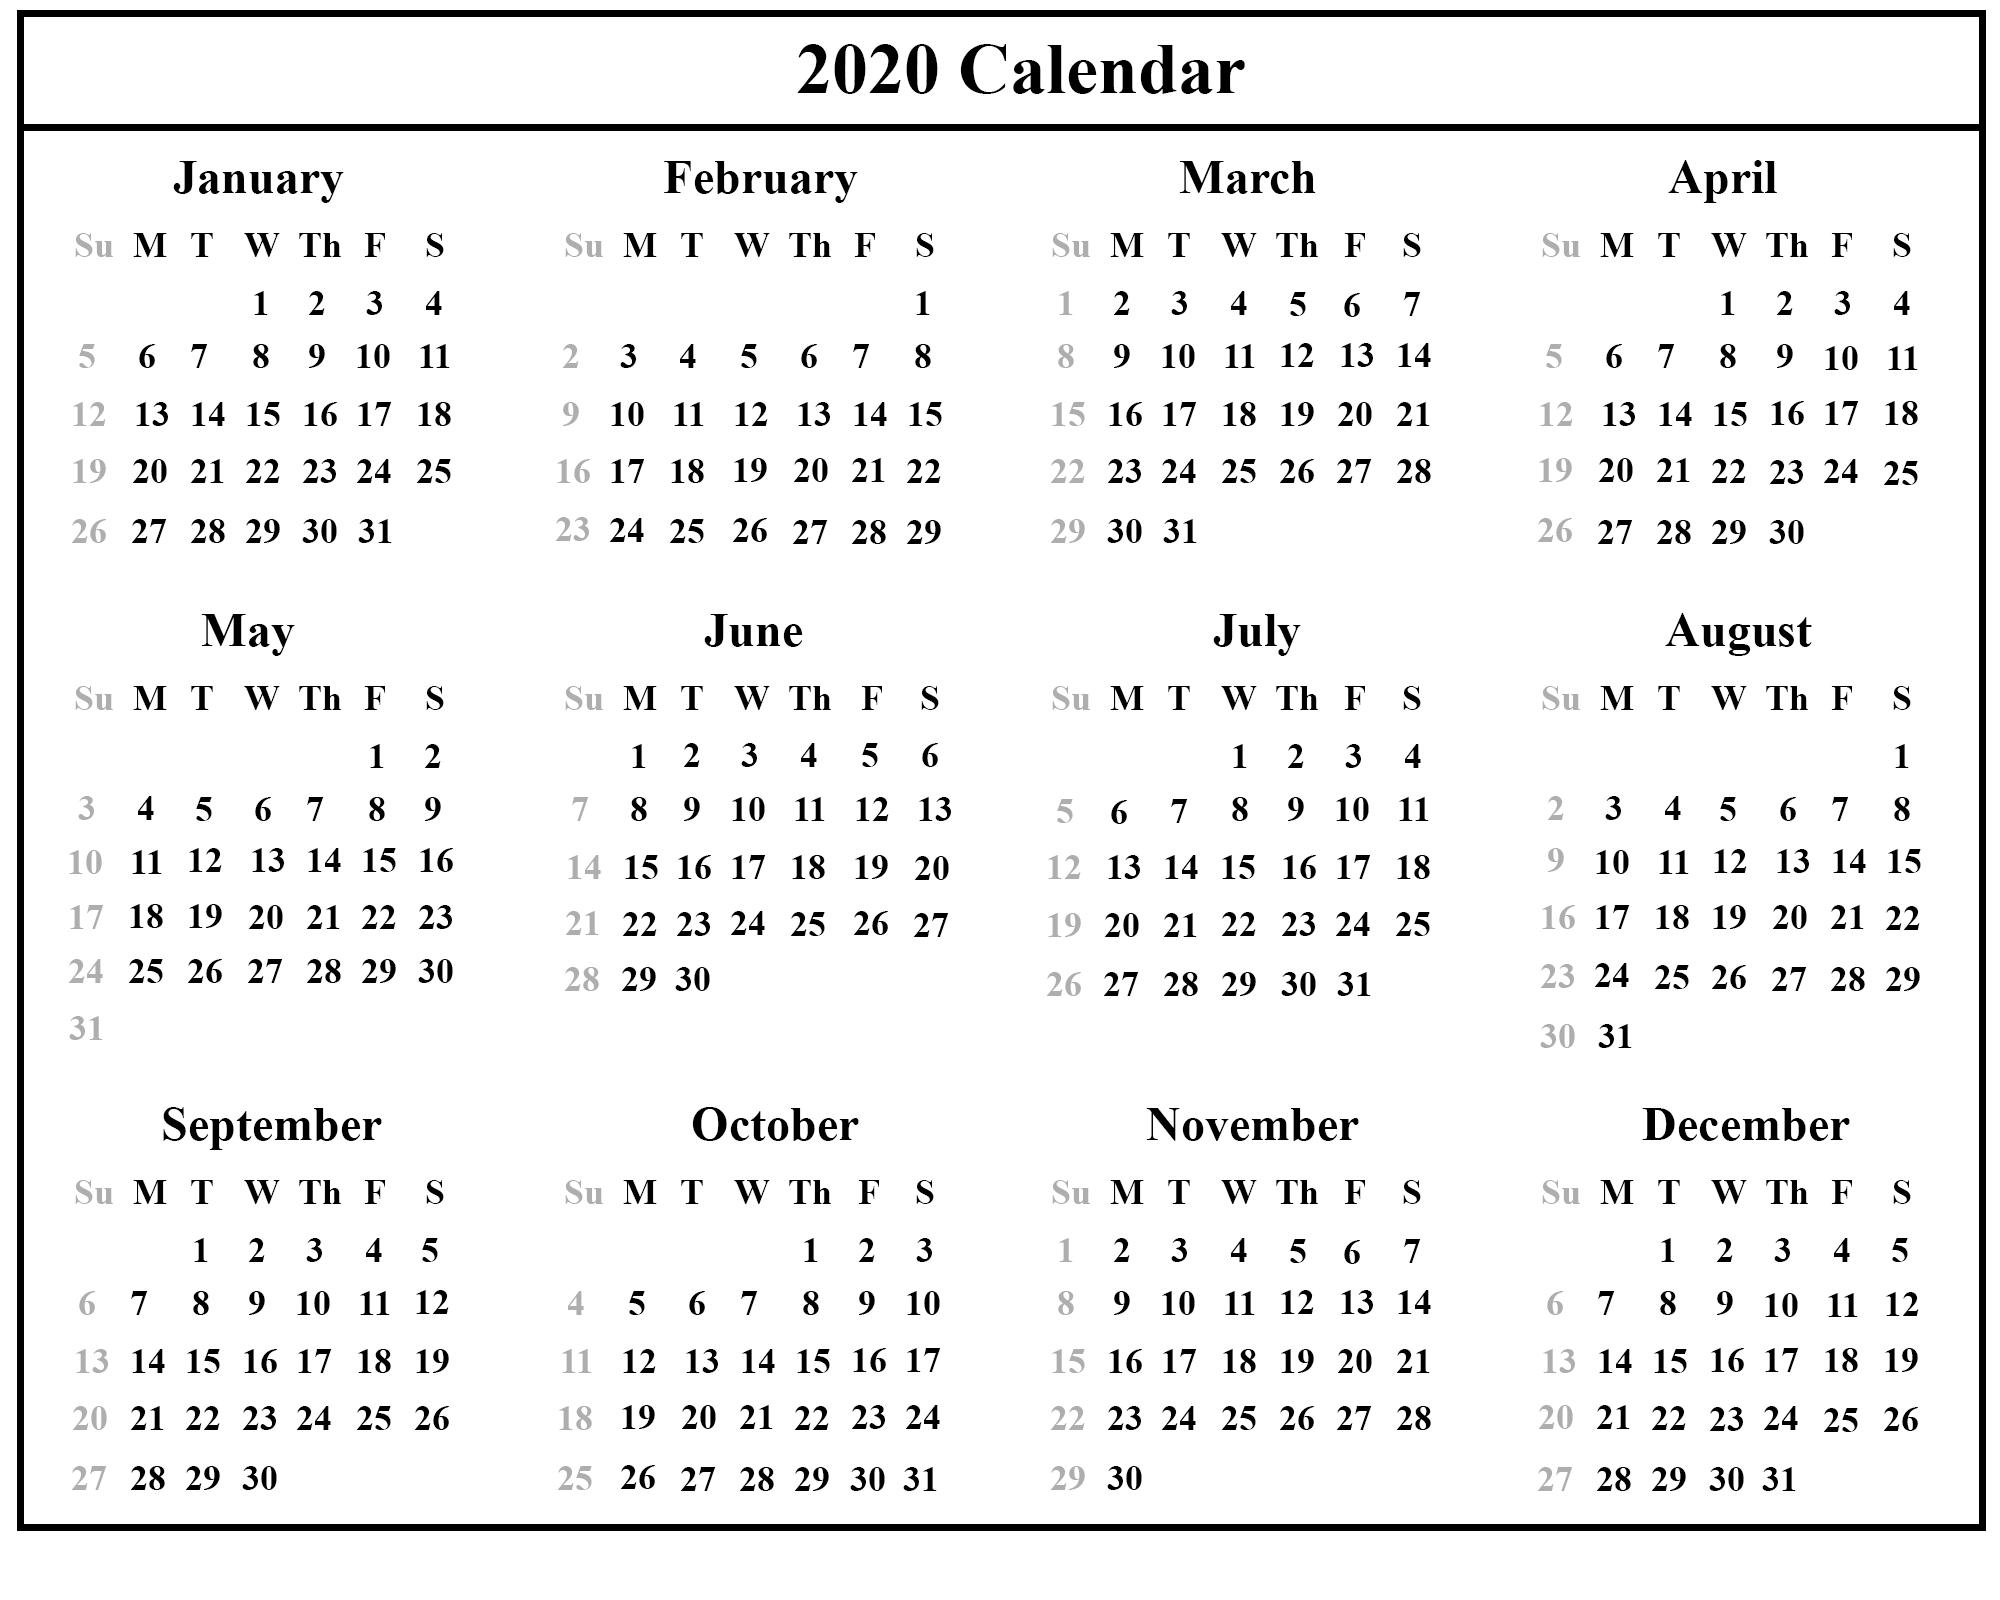 Free Printable Australia Calendar 2020 In Pdf, Excel & Word Format in 2020 Calendar Printable Free Pdf